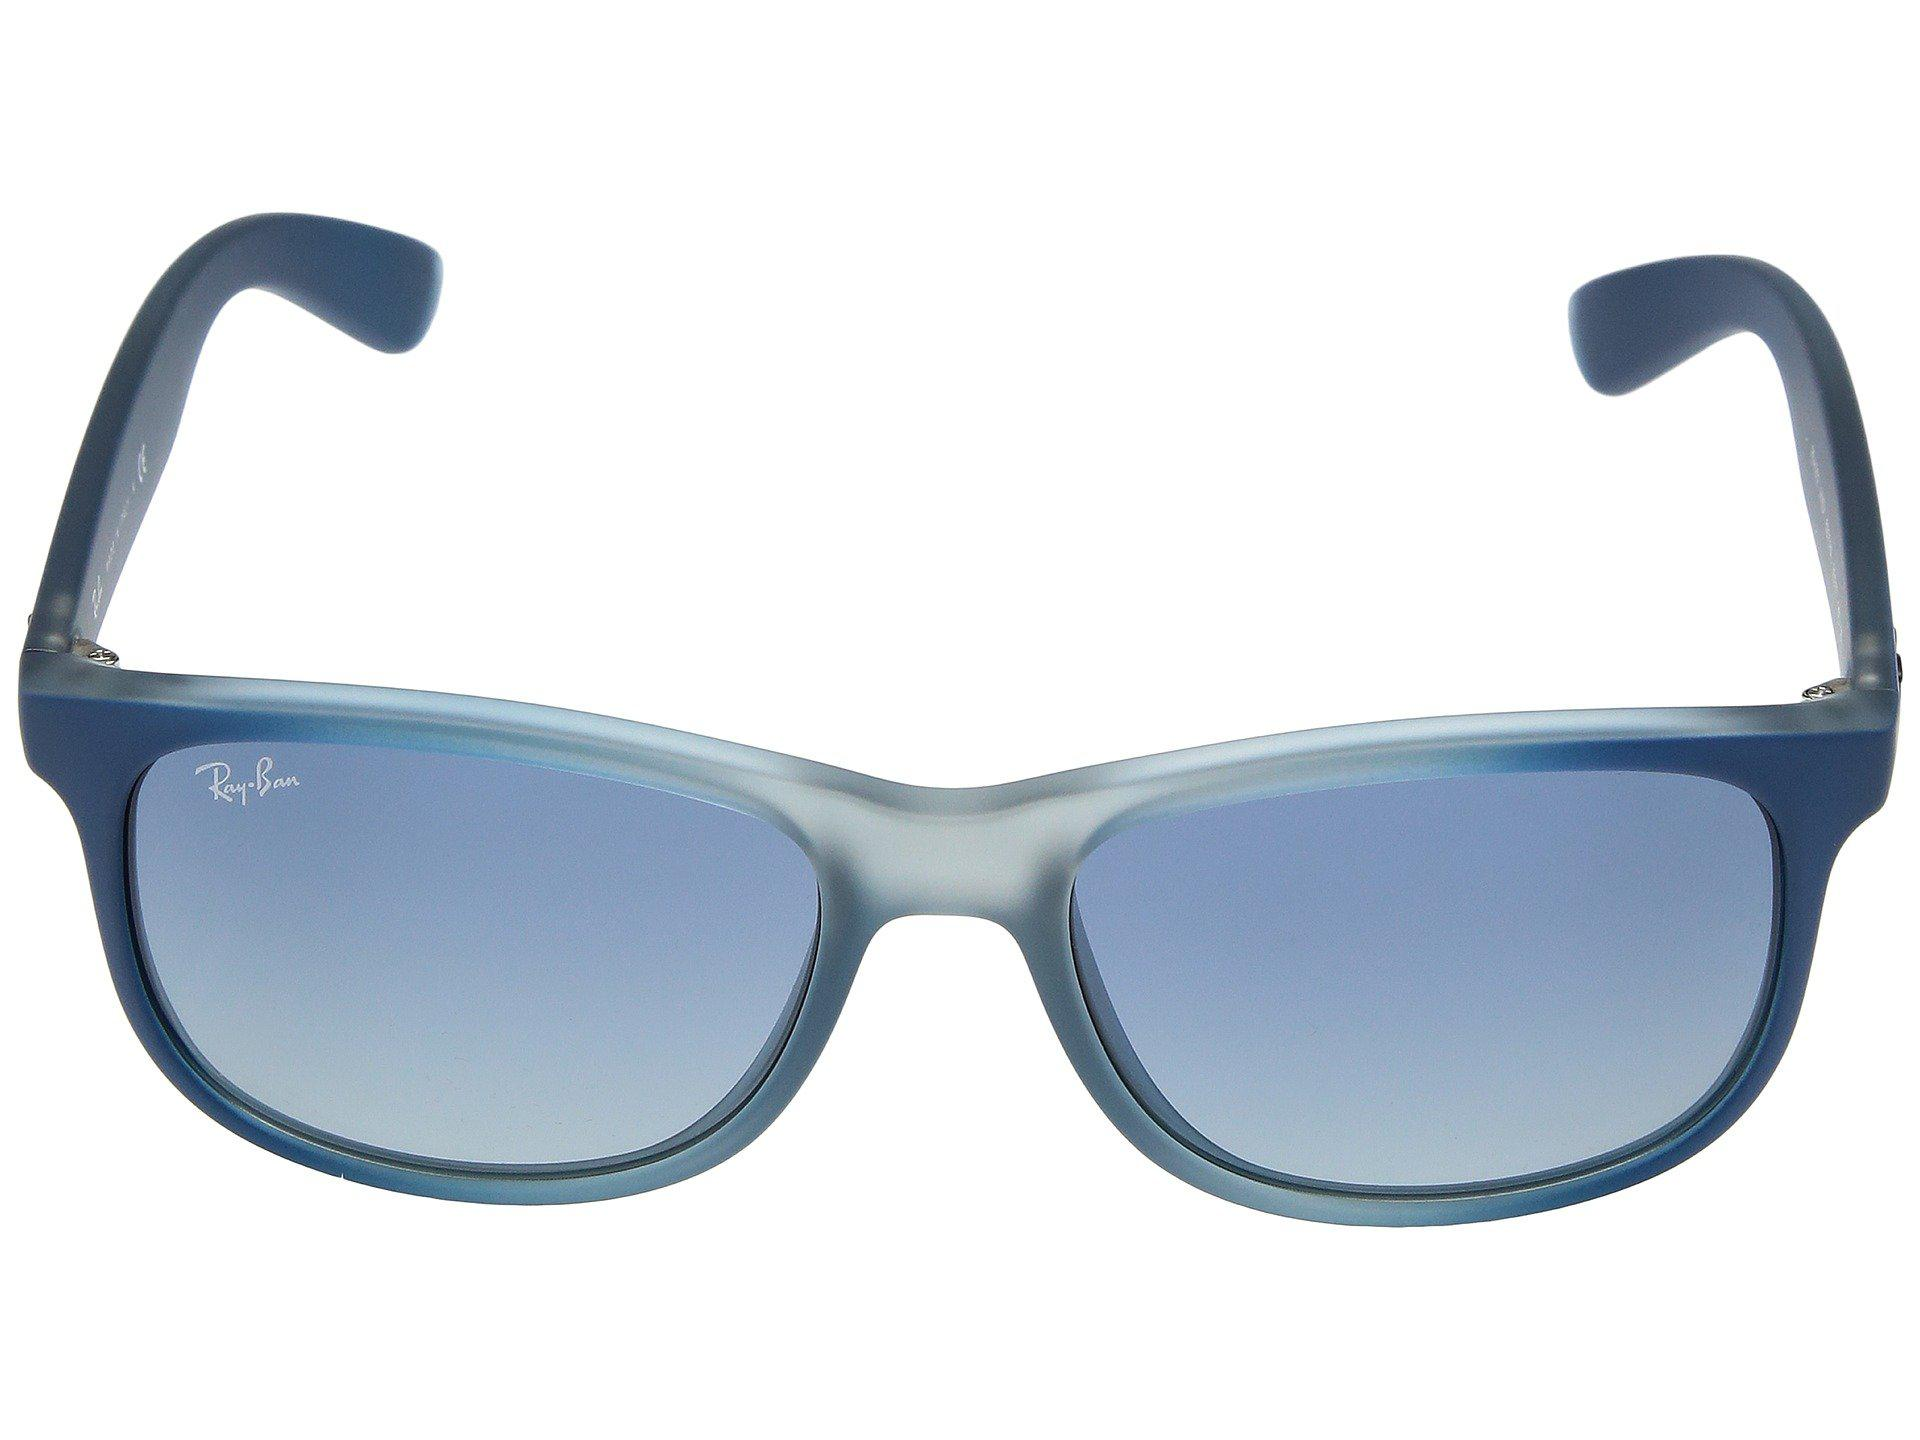 54fcc93e8ec Ray-Ban - Blue Rb4202 Andy 55mm (shiny Black) Fashion Sunglasses for Men.  View fullscreen